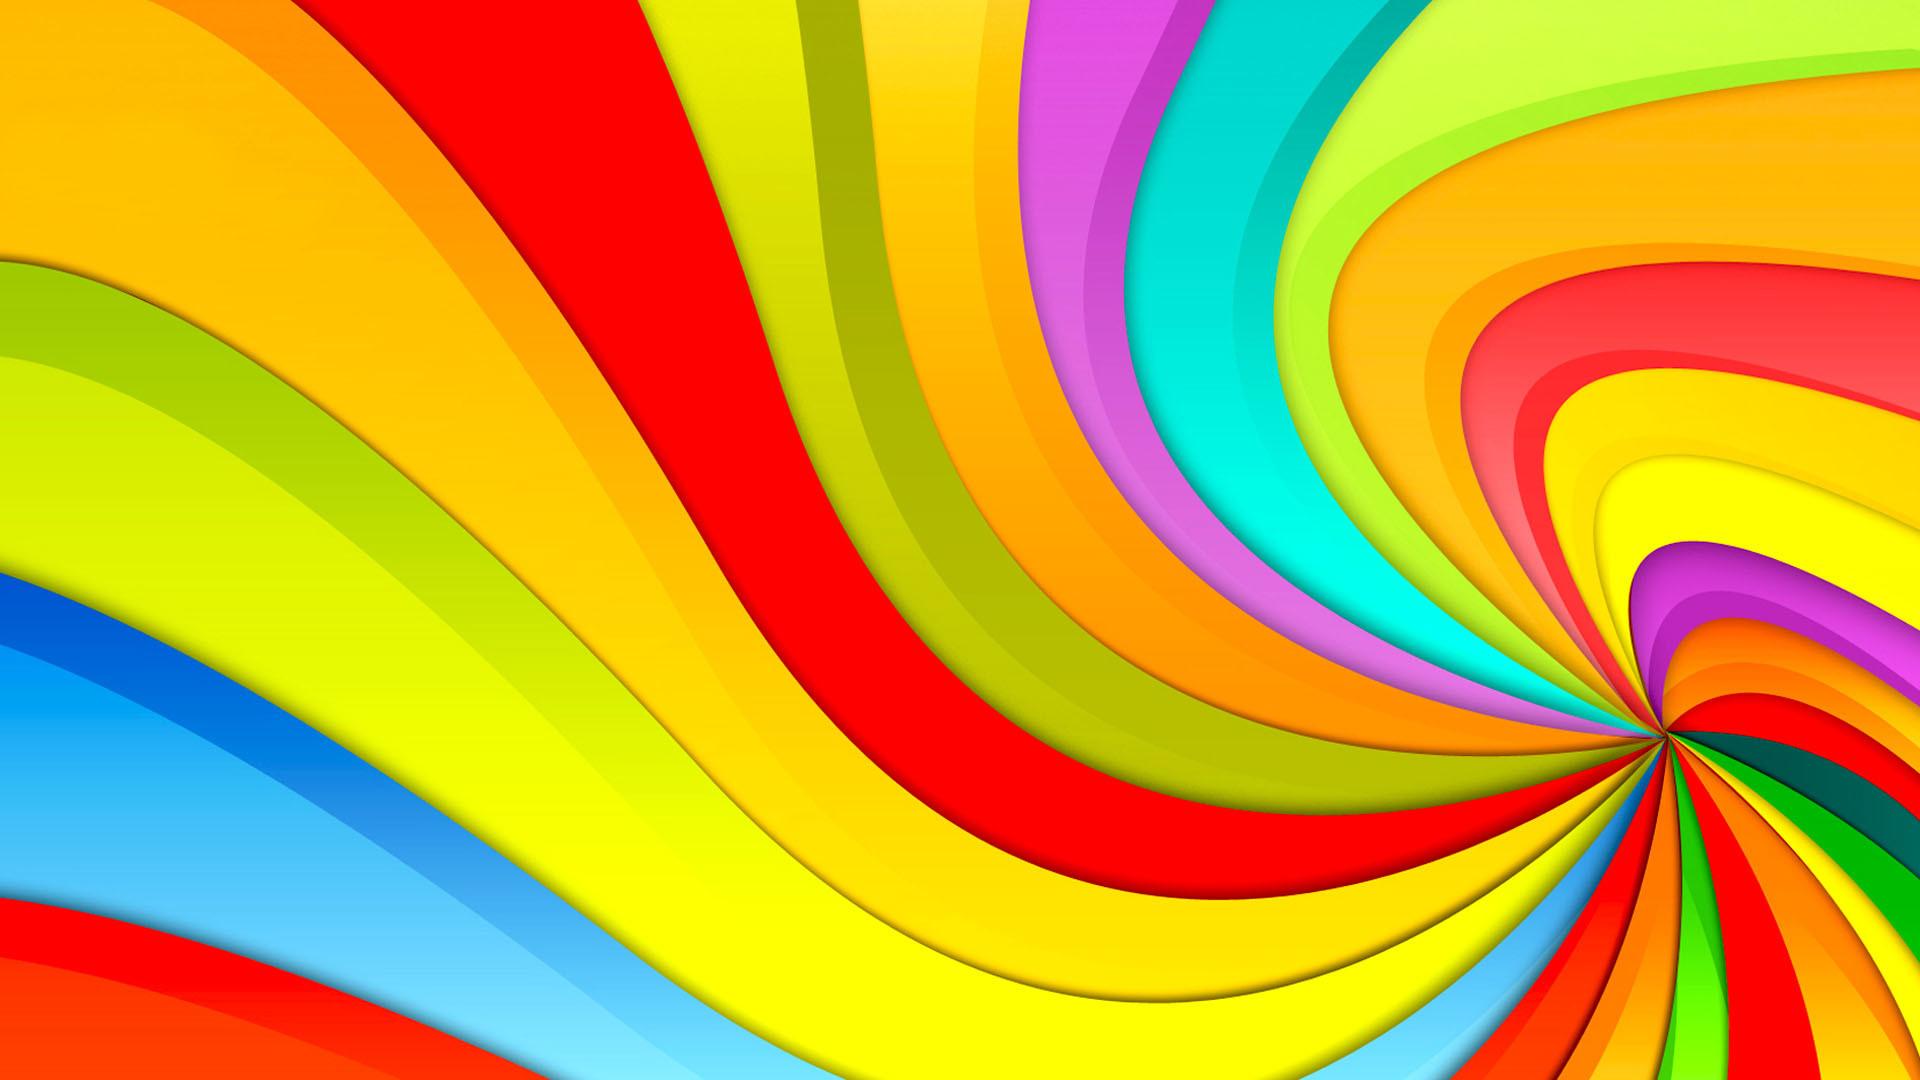 Bright Colors Wallpaper for Desktop (53+ images)